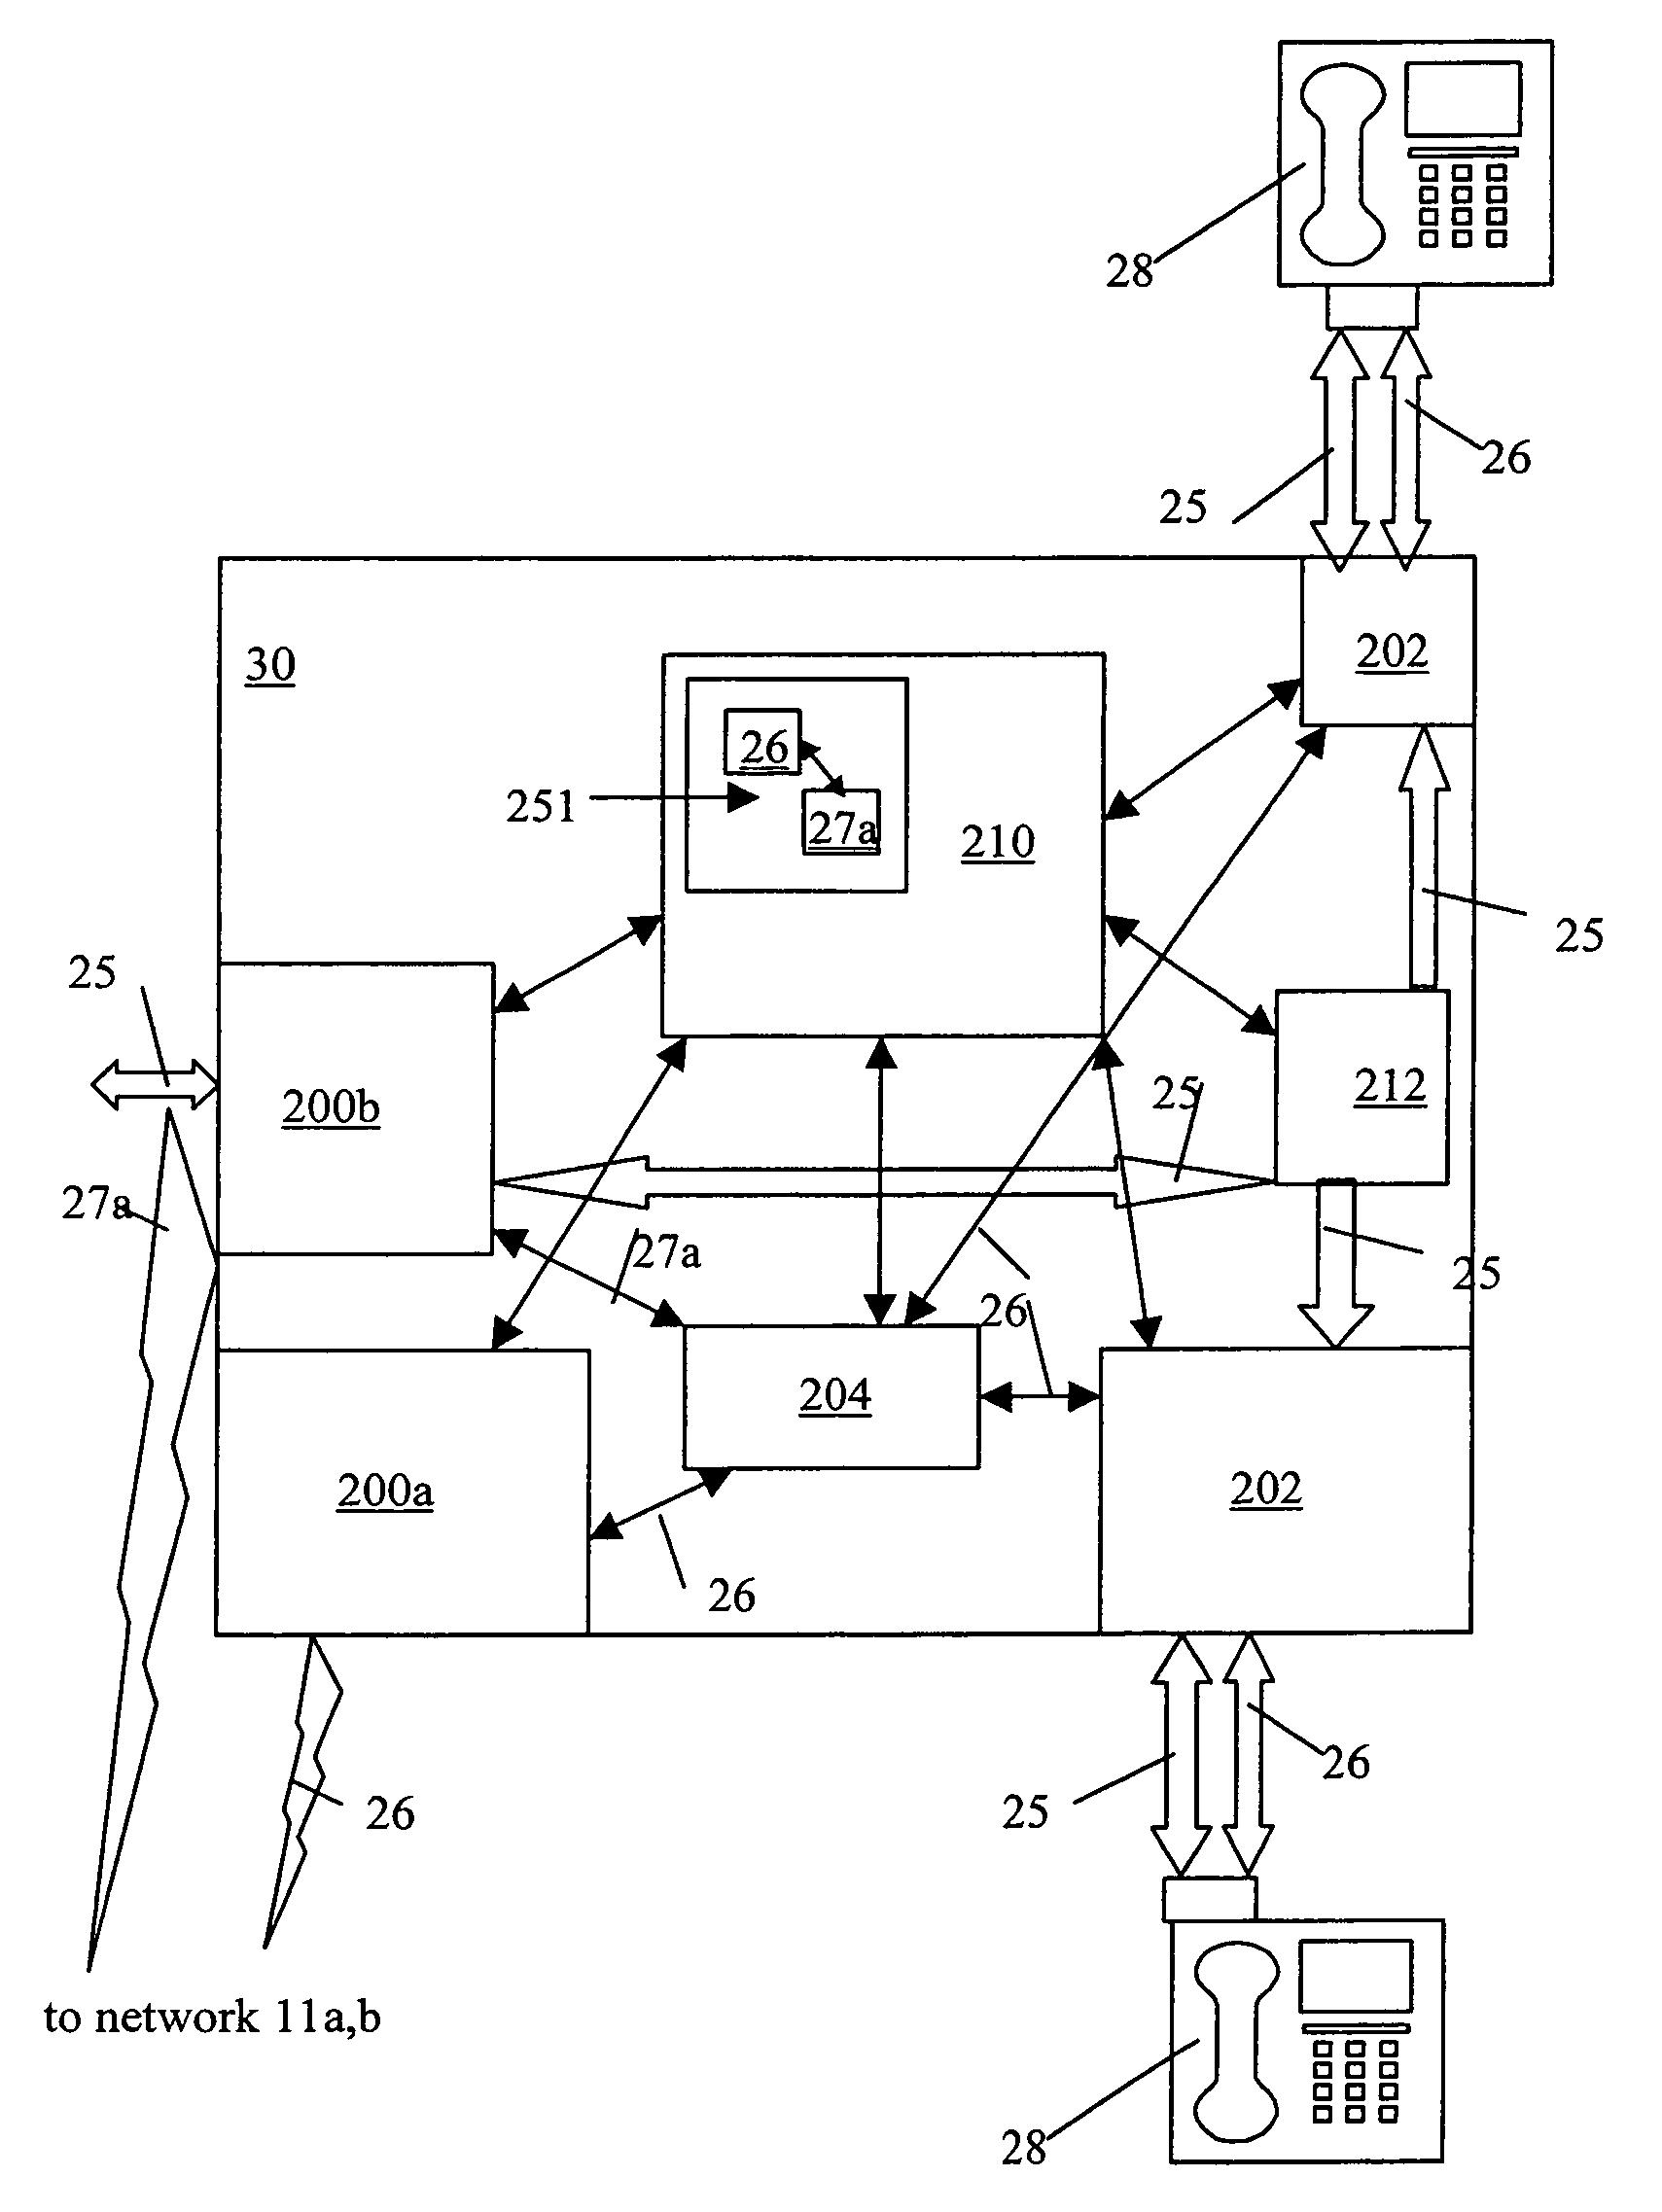 rj11 wiring diagram tip ring wiring solutions USB to RJ11 Wiring-Diagram rj11 wiring diagram tip ring basic guide